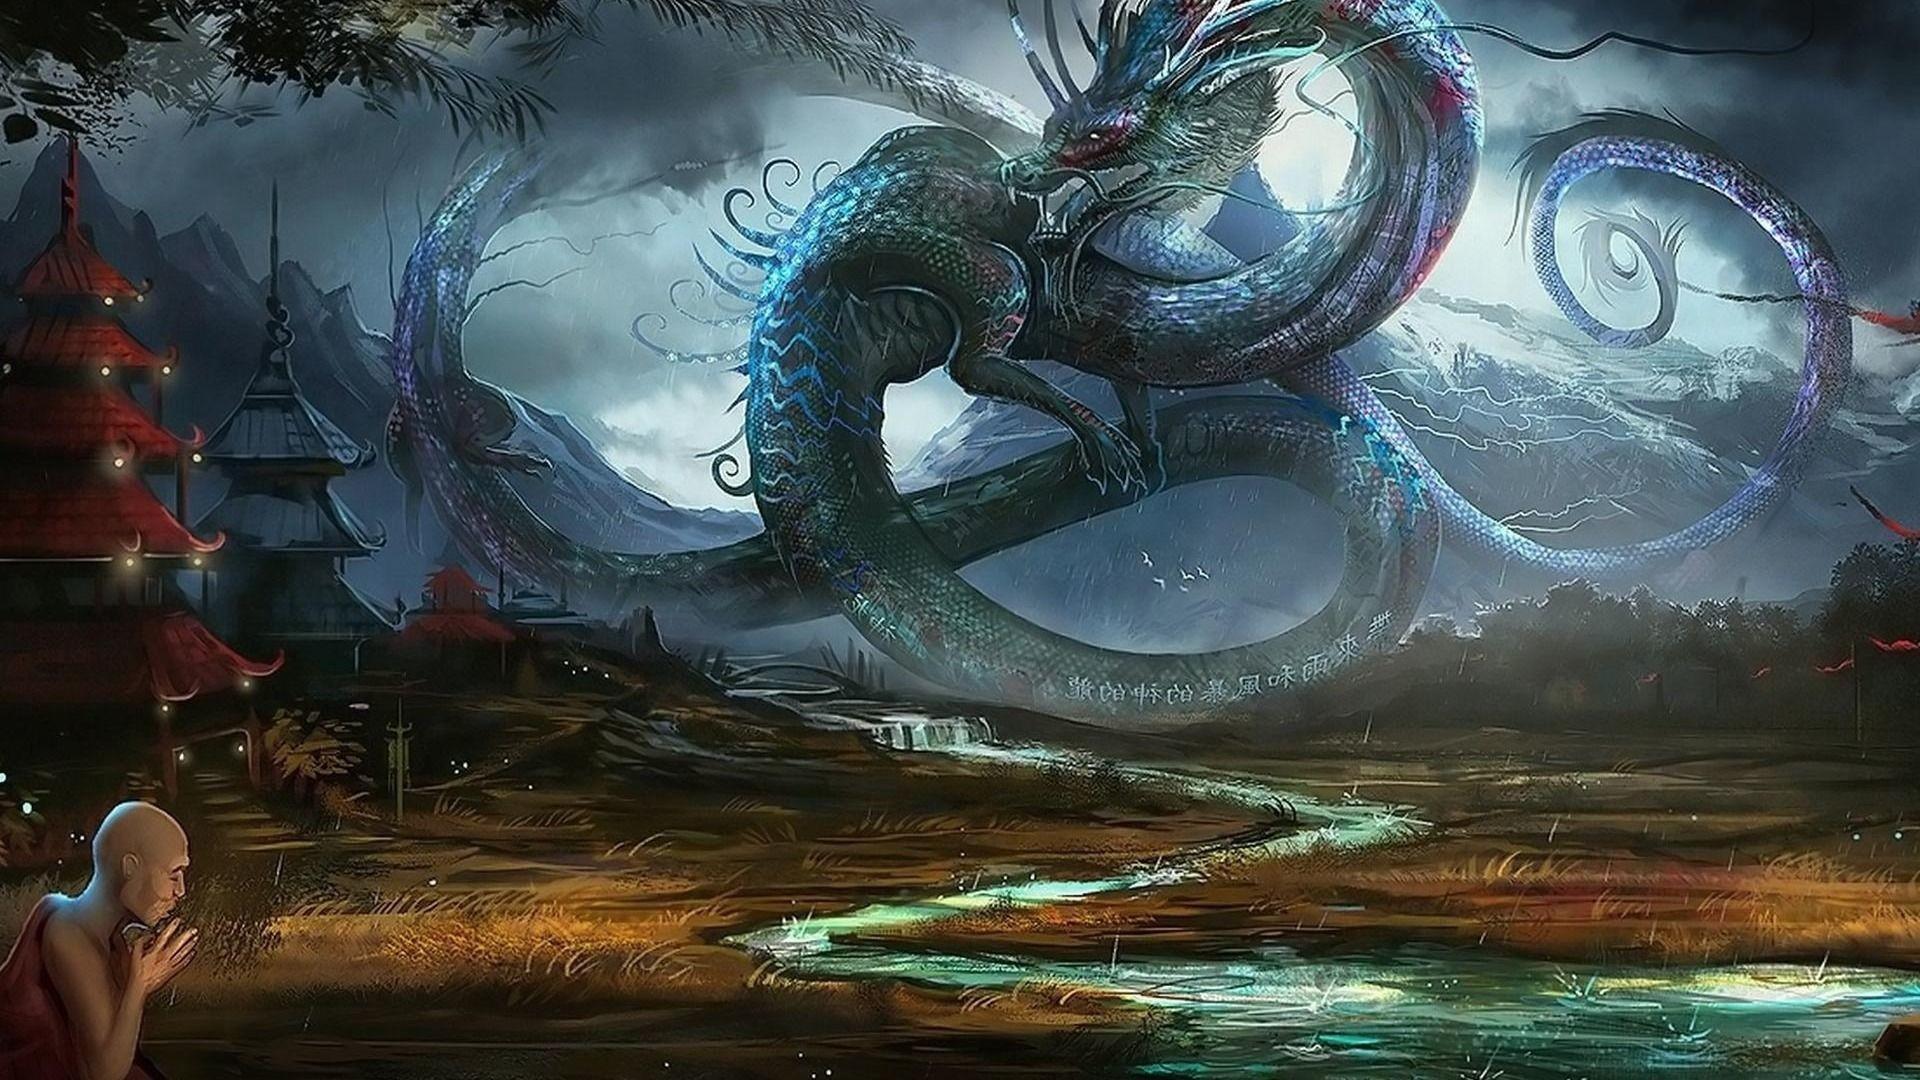 water dragon wallpaper 76 images